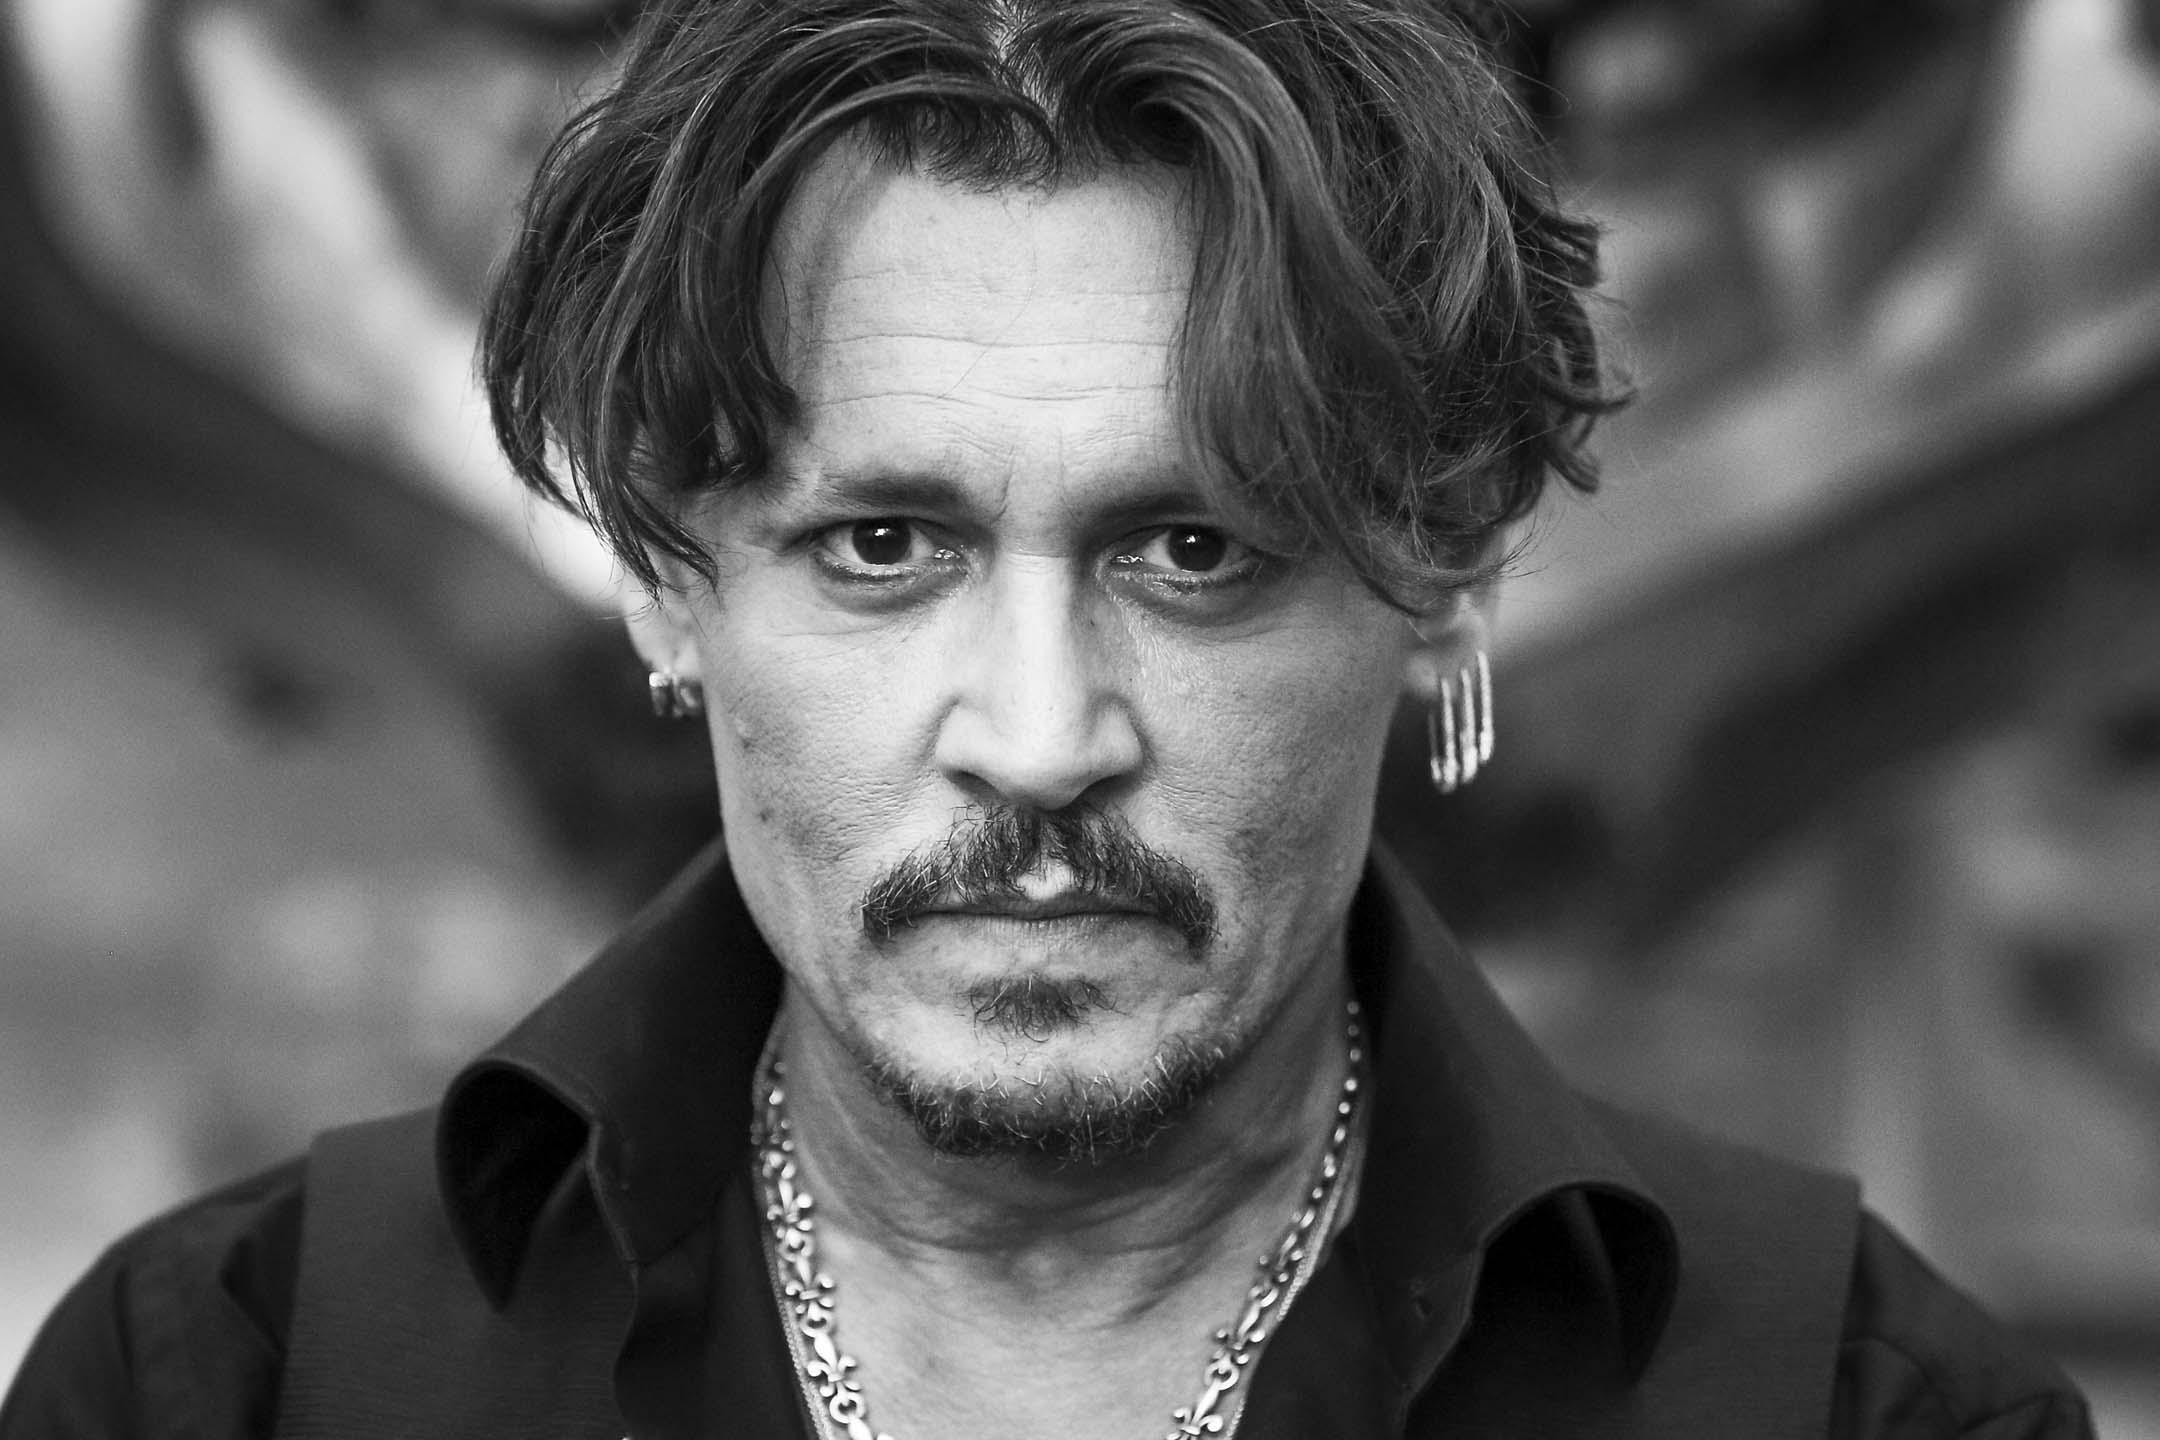 2017年5月18日,強尼.戴普(Johnny Depp)在杜比劇院出席《加勒比海盜-神鬼奇航:死無對證》(Pirates of the Caribbean: Dead Men Tell No Tales) 首映。 攝:Rich Fury/Getty Images